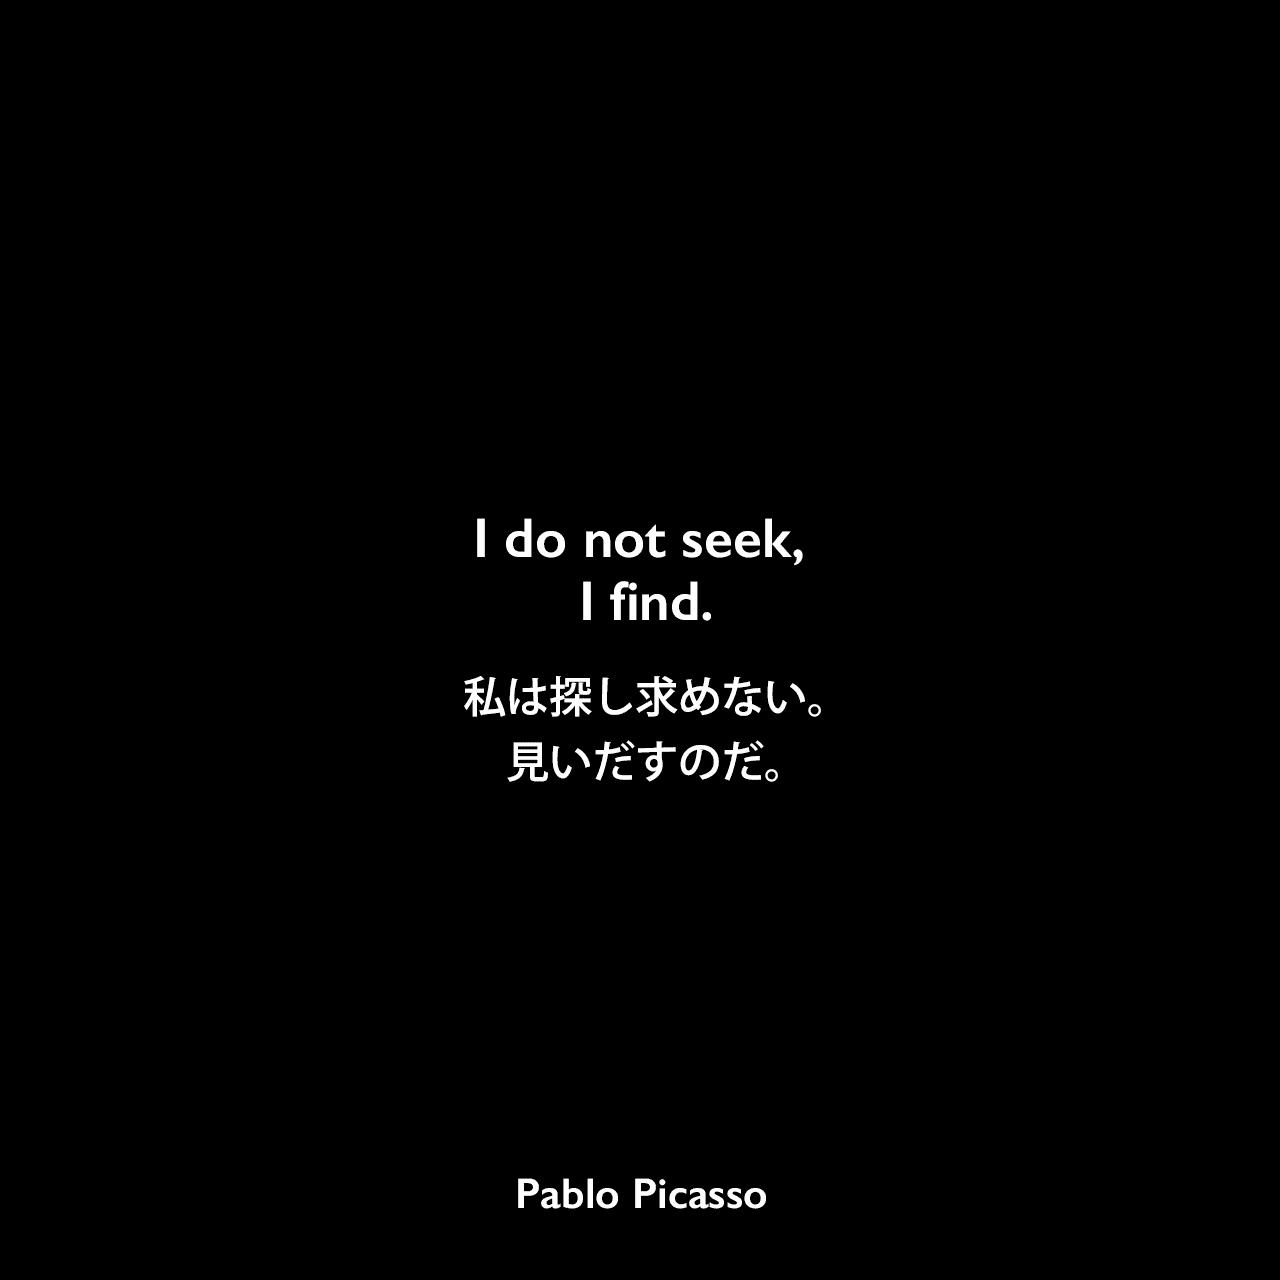 I do not seek, I find.私は探し求めない。見いだすのだ。Pablo Picasso